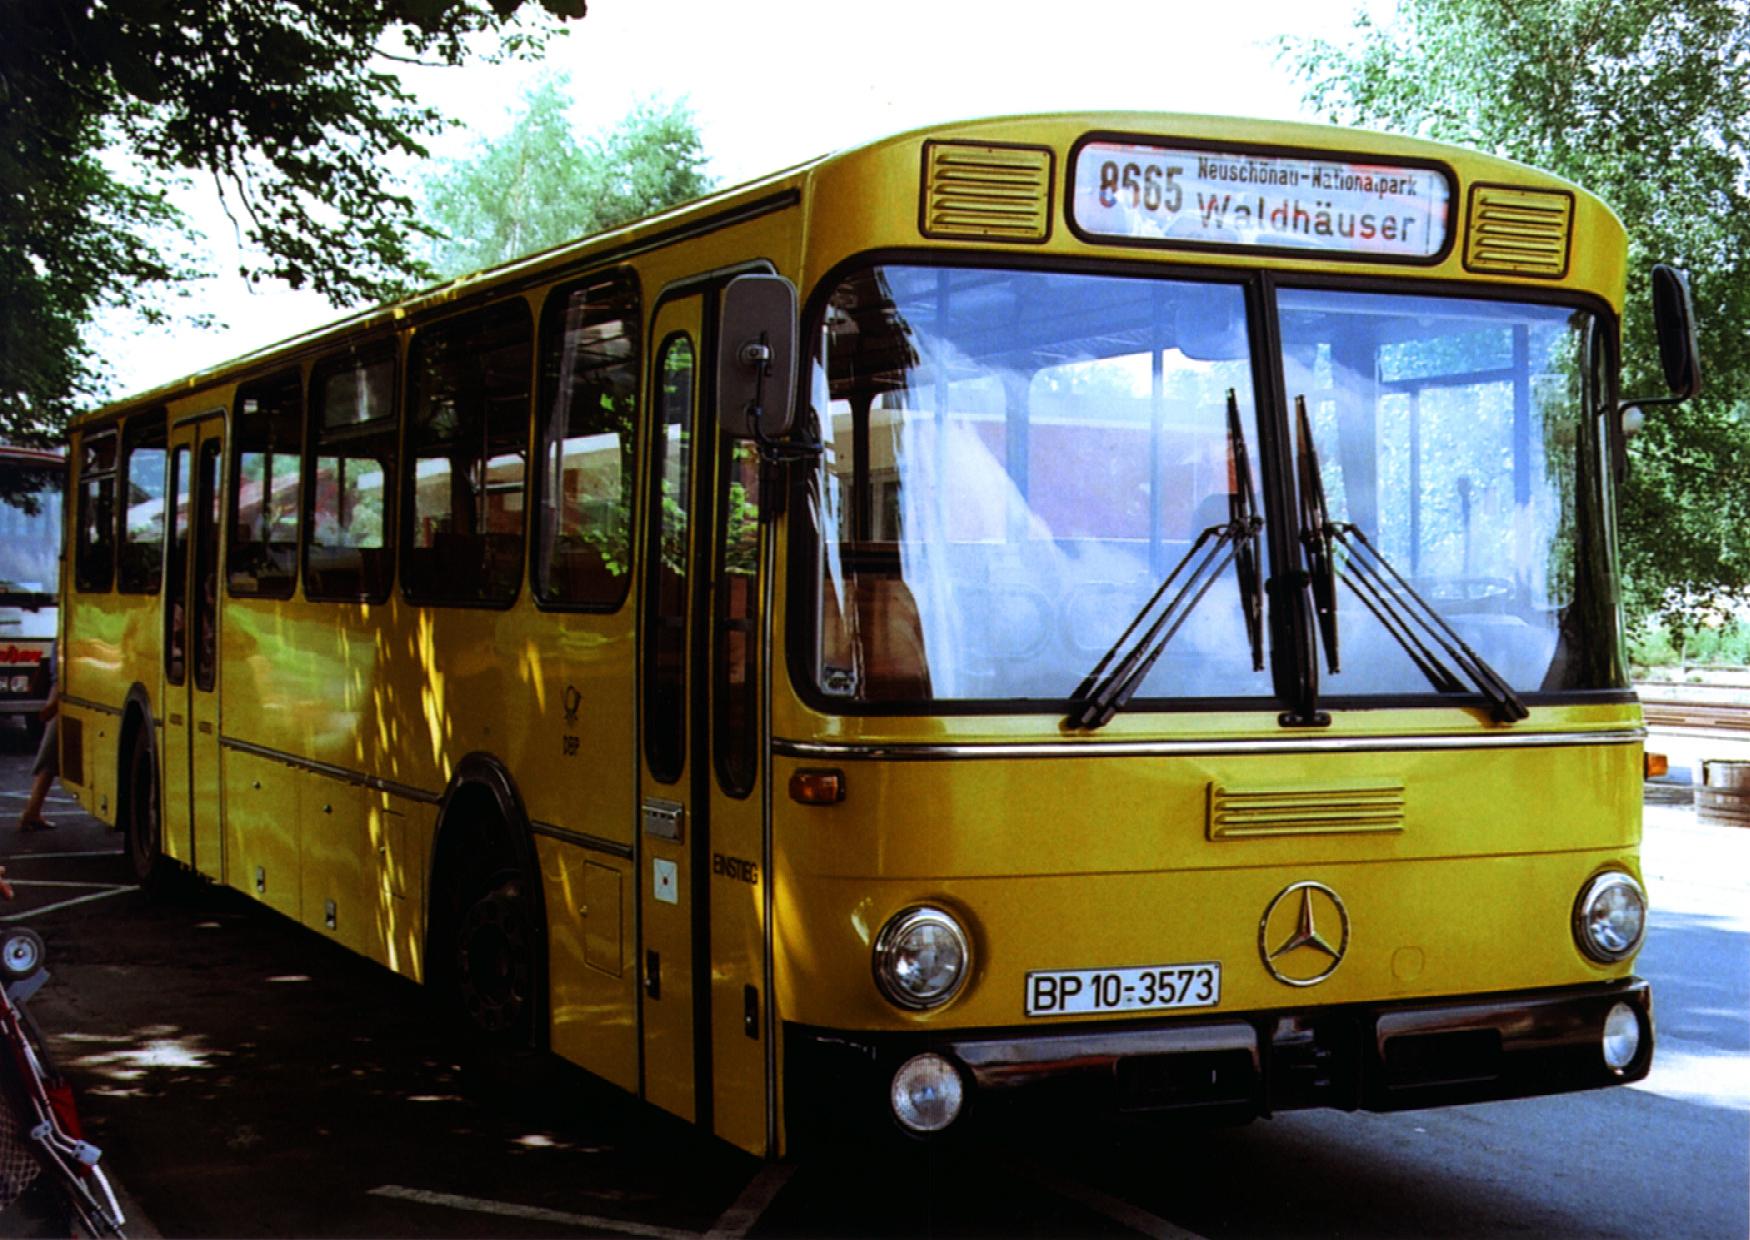 Wahing Post Bus Tour Heartland